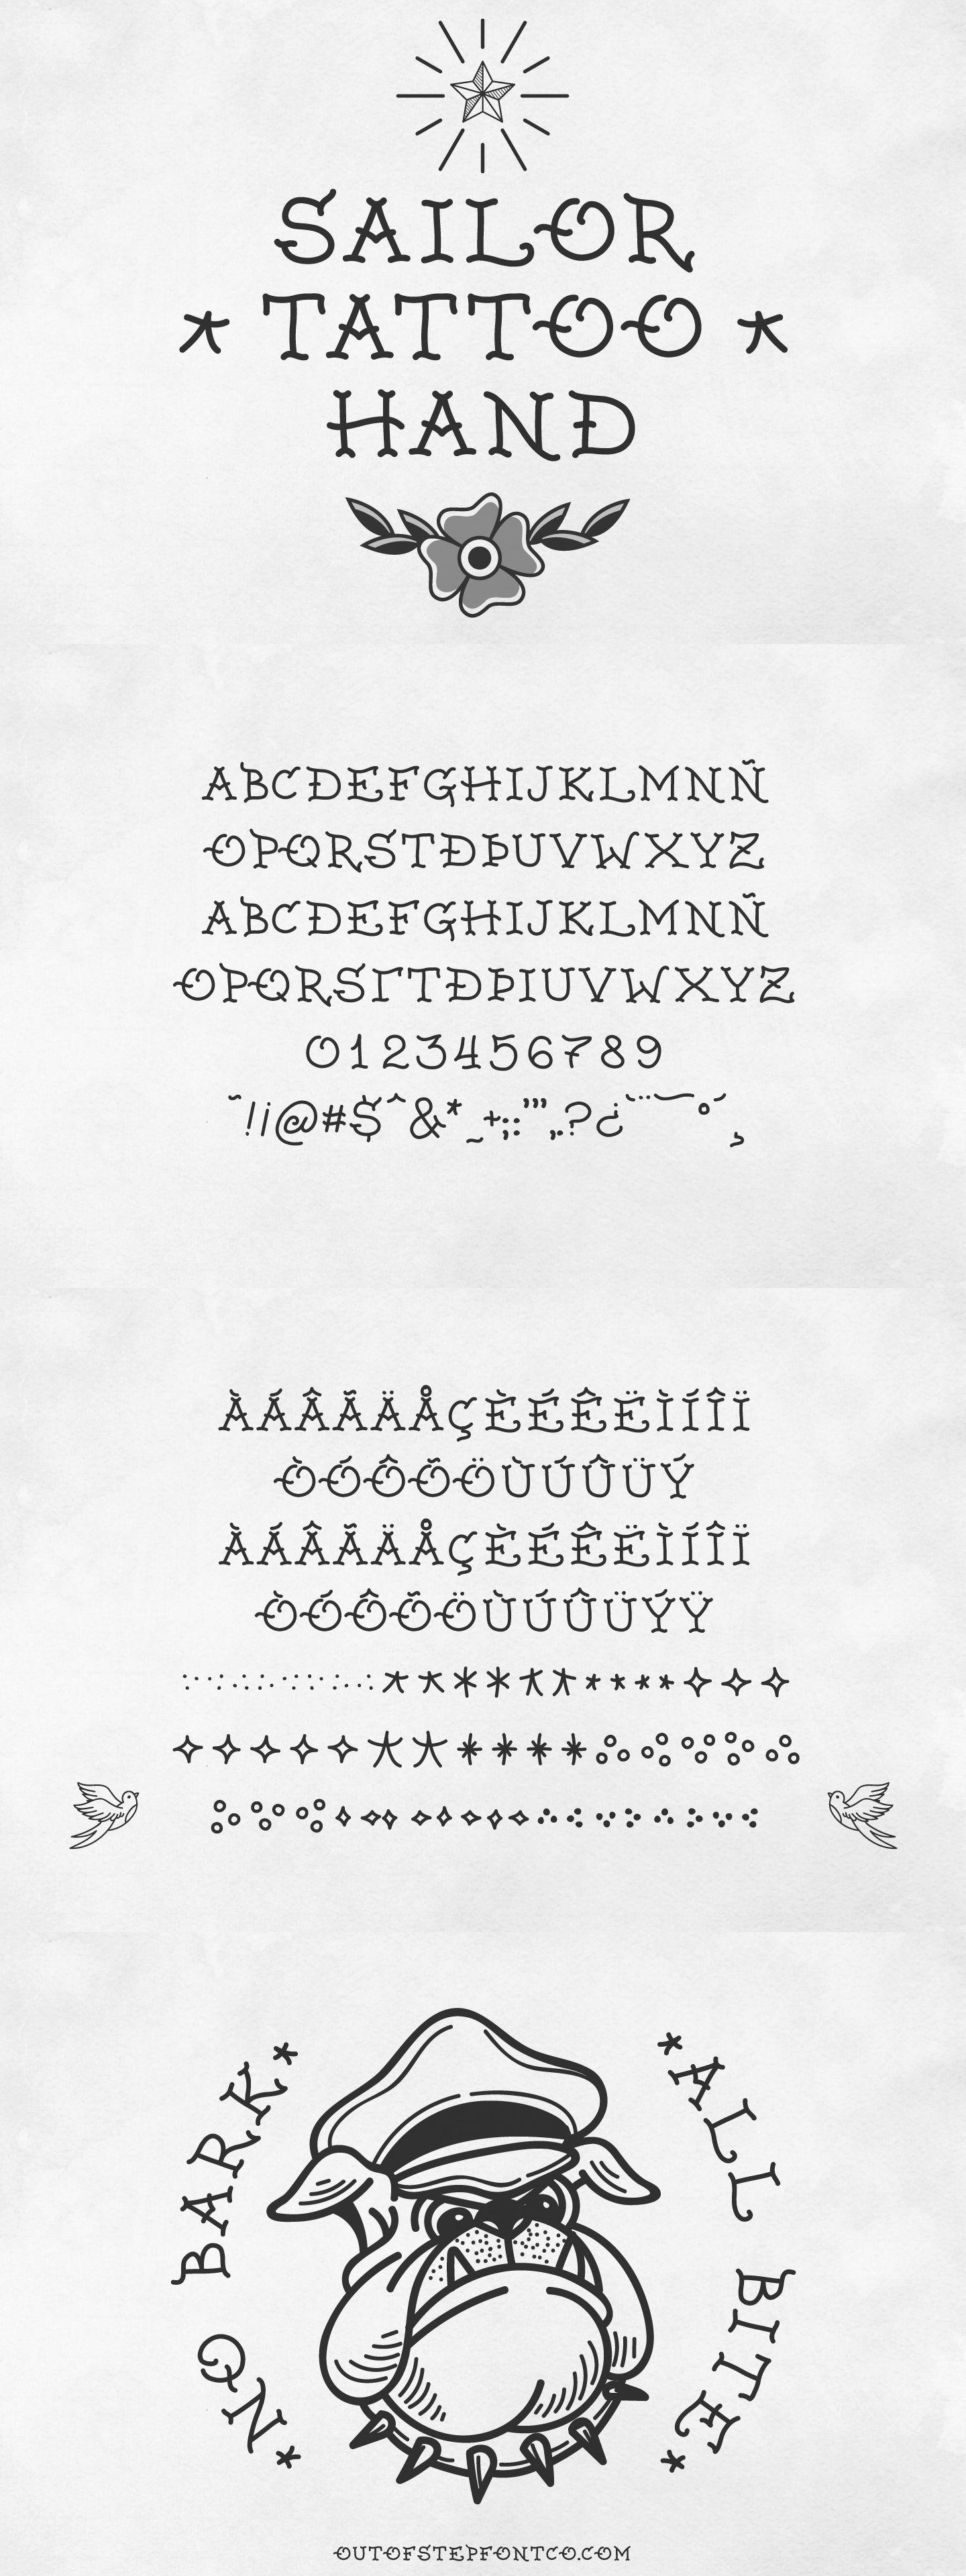 Sailor Tattoo Hand Tattoo lettering fonts, Old school